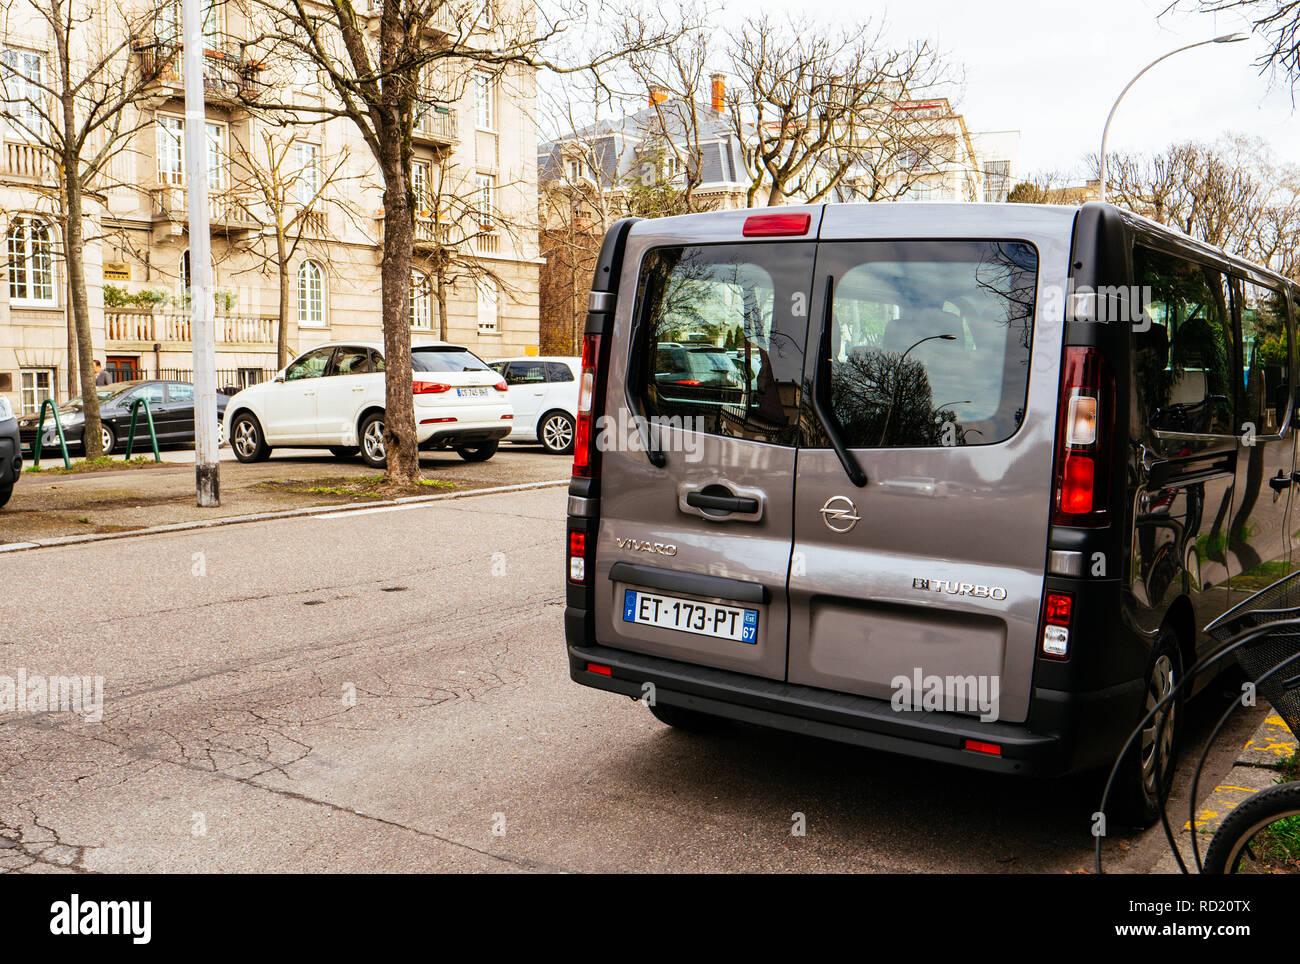 paris transportation bus street stockfotos paris. Black Bedroom Furniture Sets. Home Design Ideas